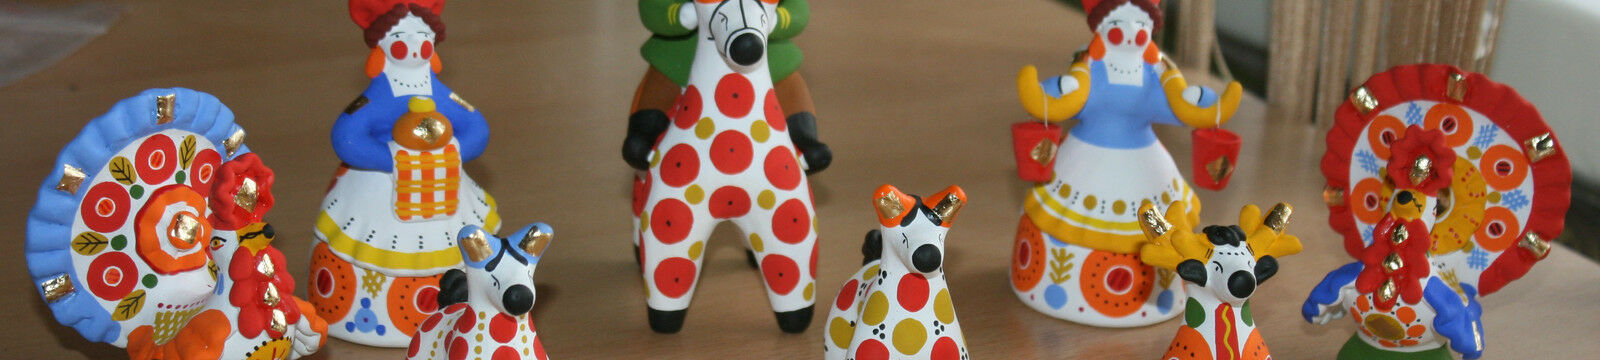 Kamruss Blown Glass & Dymkovo Toy